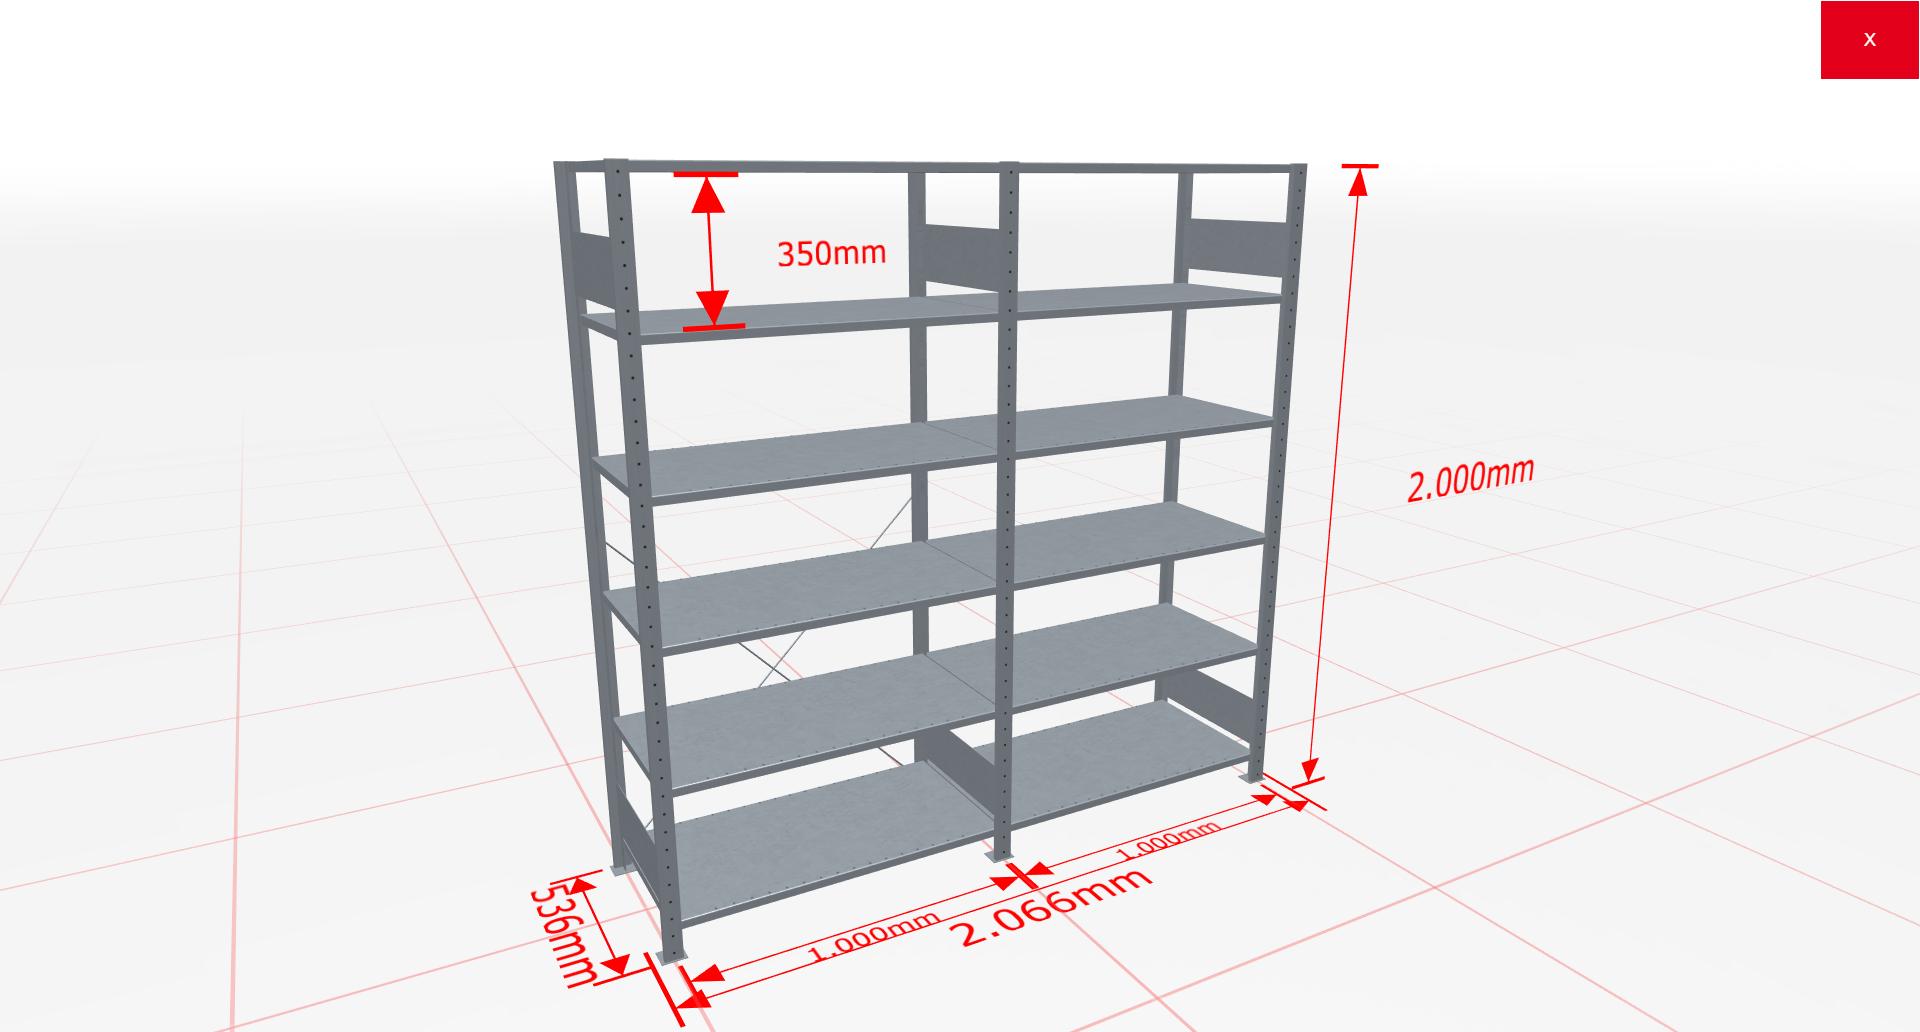 Fachbodenregal Komplettregal 2000x2066x500 mm (HxBxT) SCHULTE Lagertechnik verzinkt 6 Ebenen  150 kg je Boden